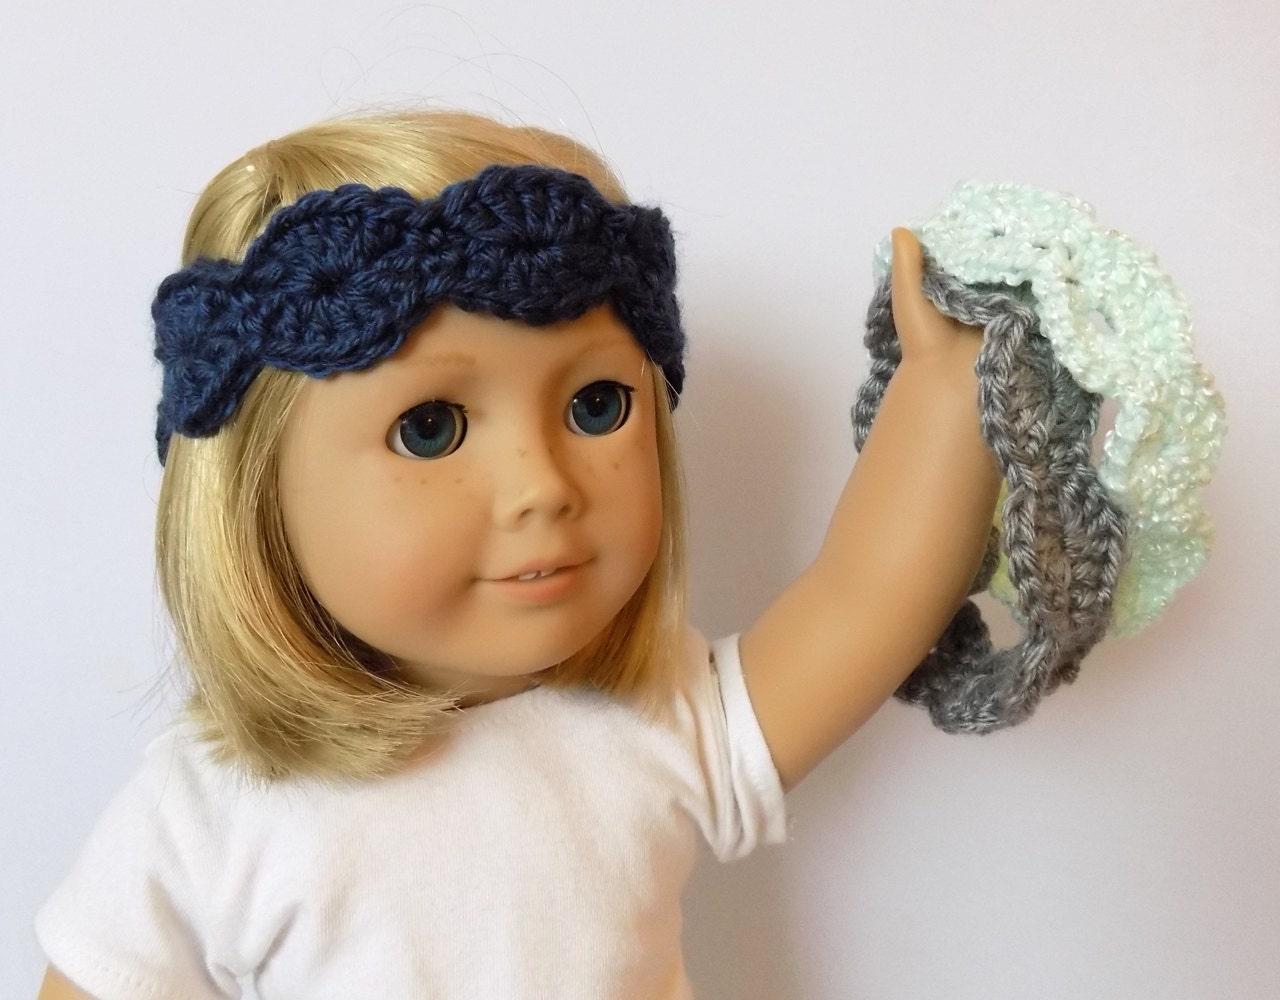 Knit Doll Headband Doll Clothes 18 Inch Doll By